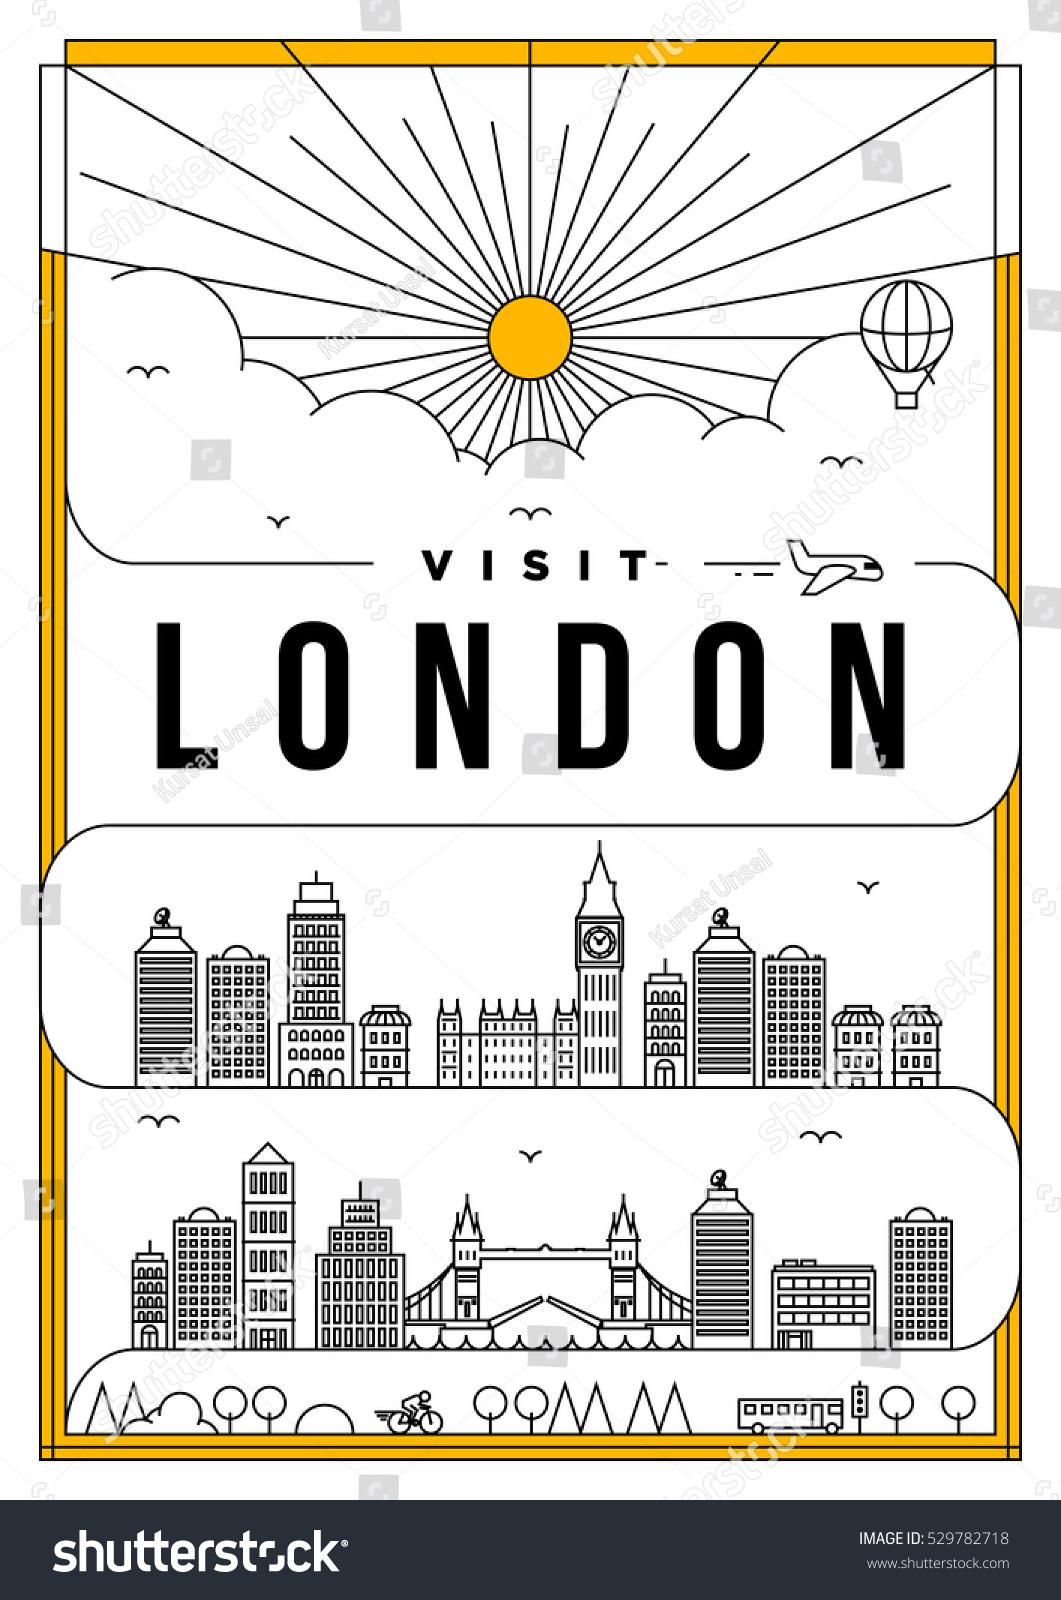 Poster design london - Linear Travel London Poster Design